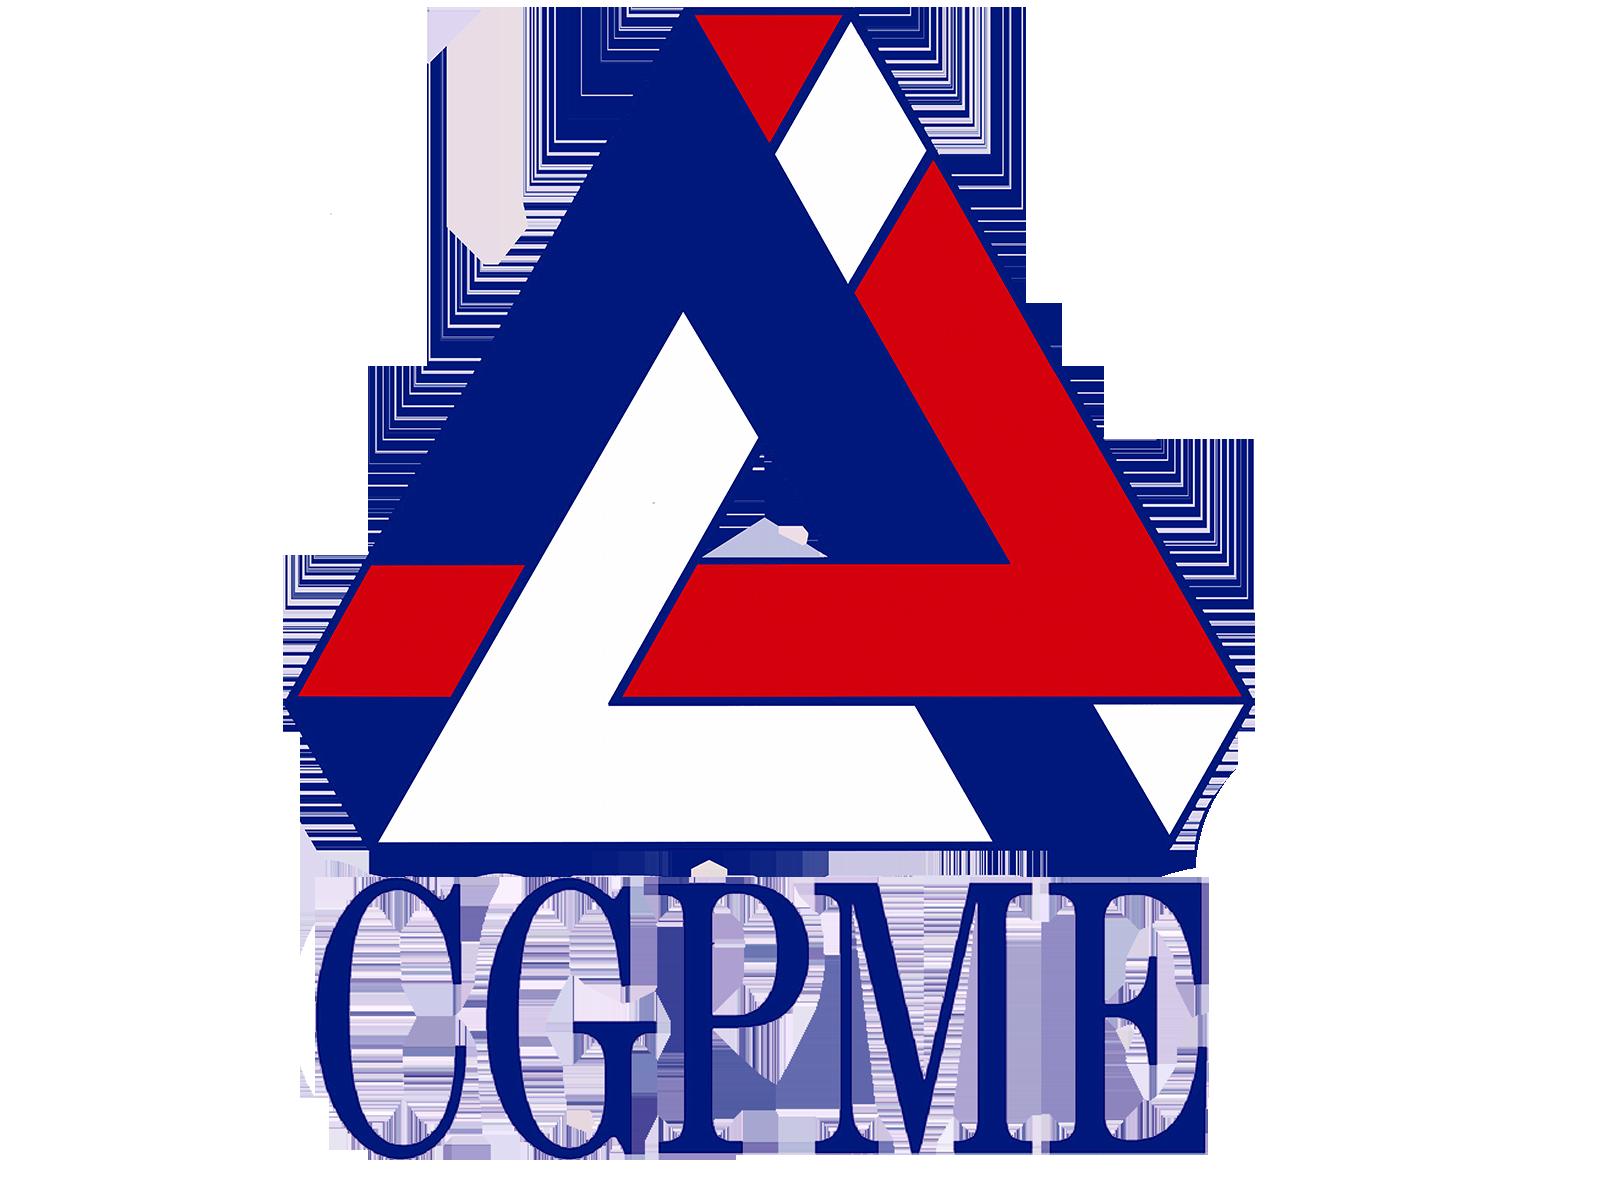 http://altemis-conseil.fr/wp-content/uploads/2015/09/CGPME.png